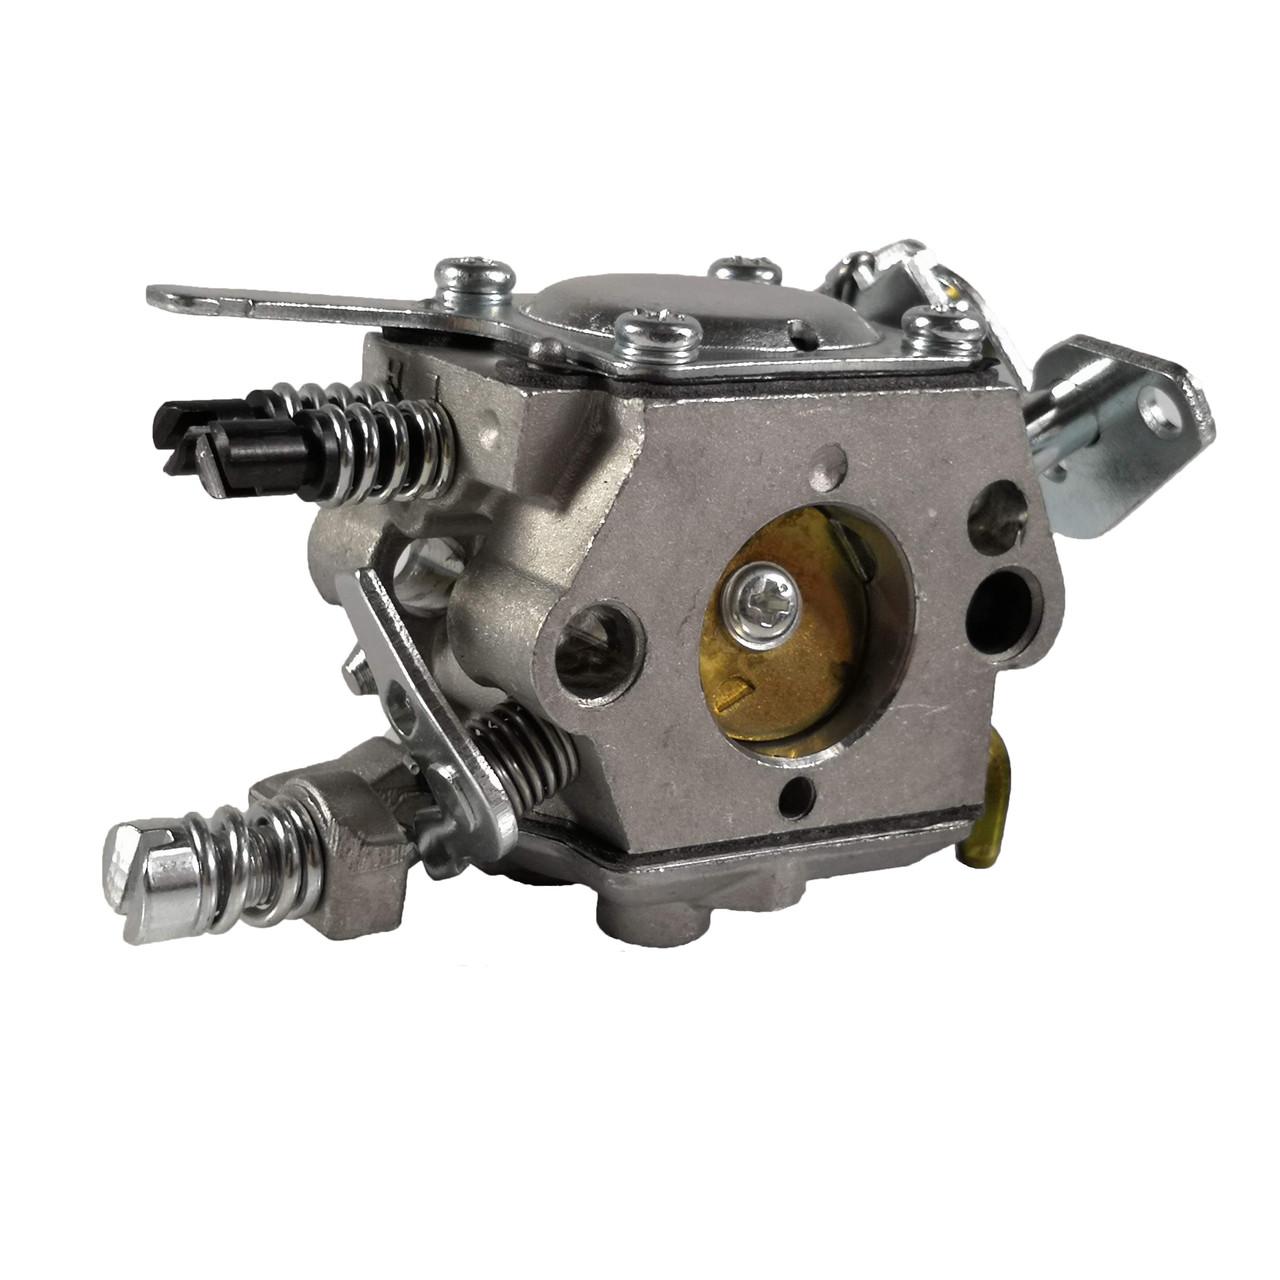 Карбюратор для бензопилы Husqvarna 136-137-142 Benzoritm